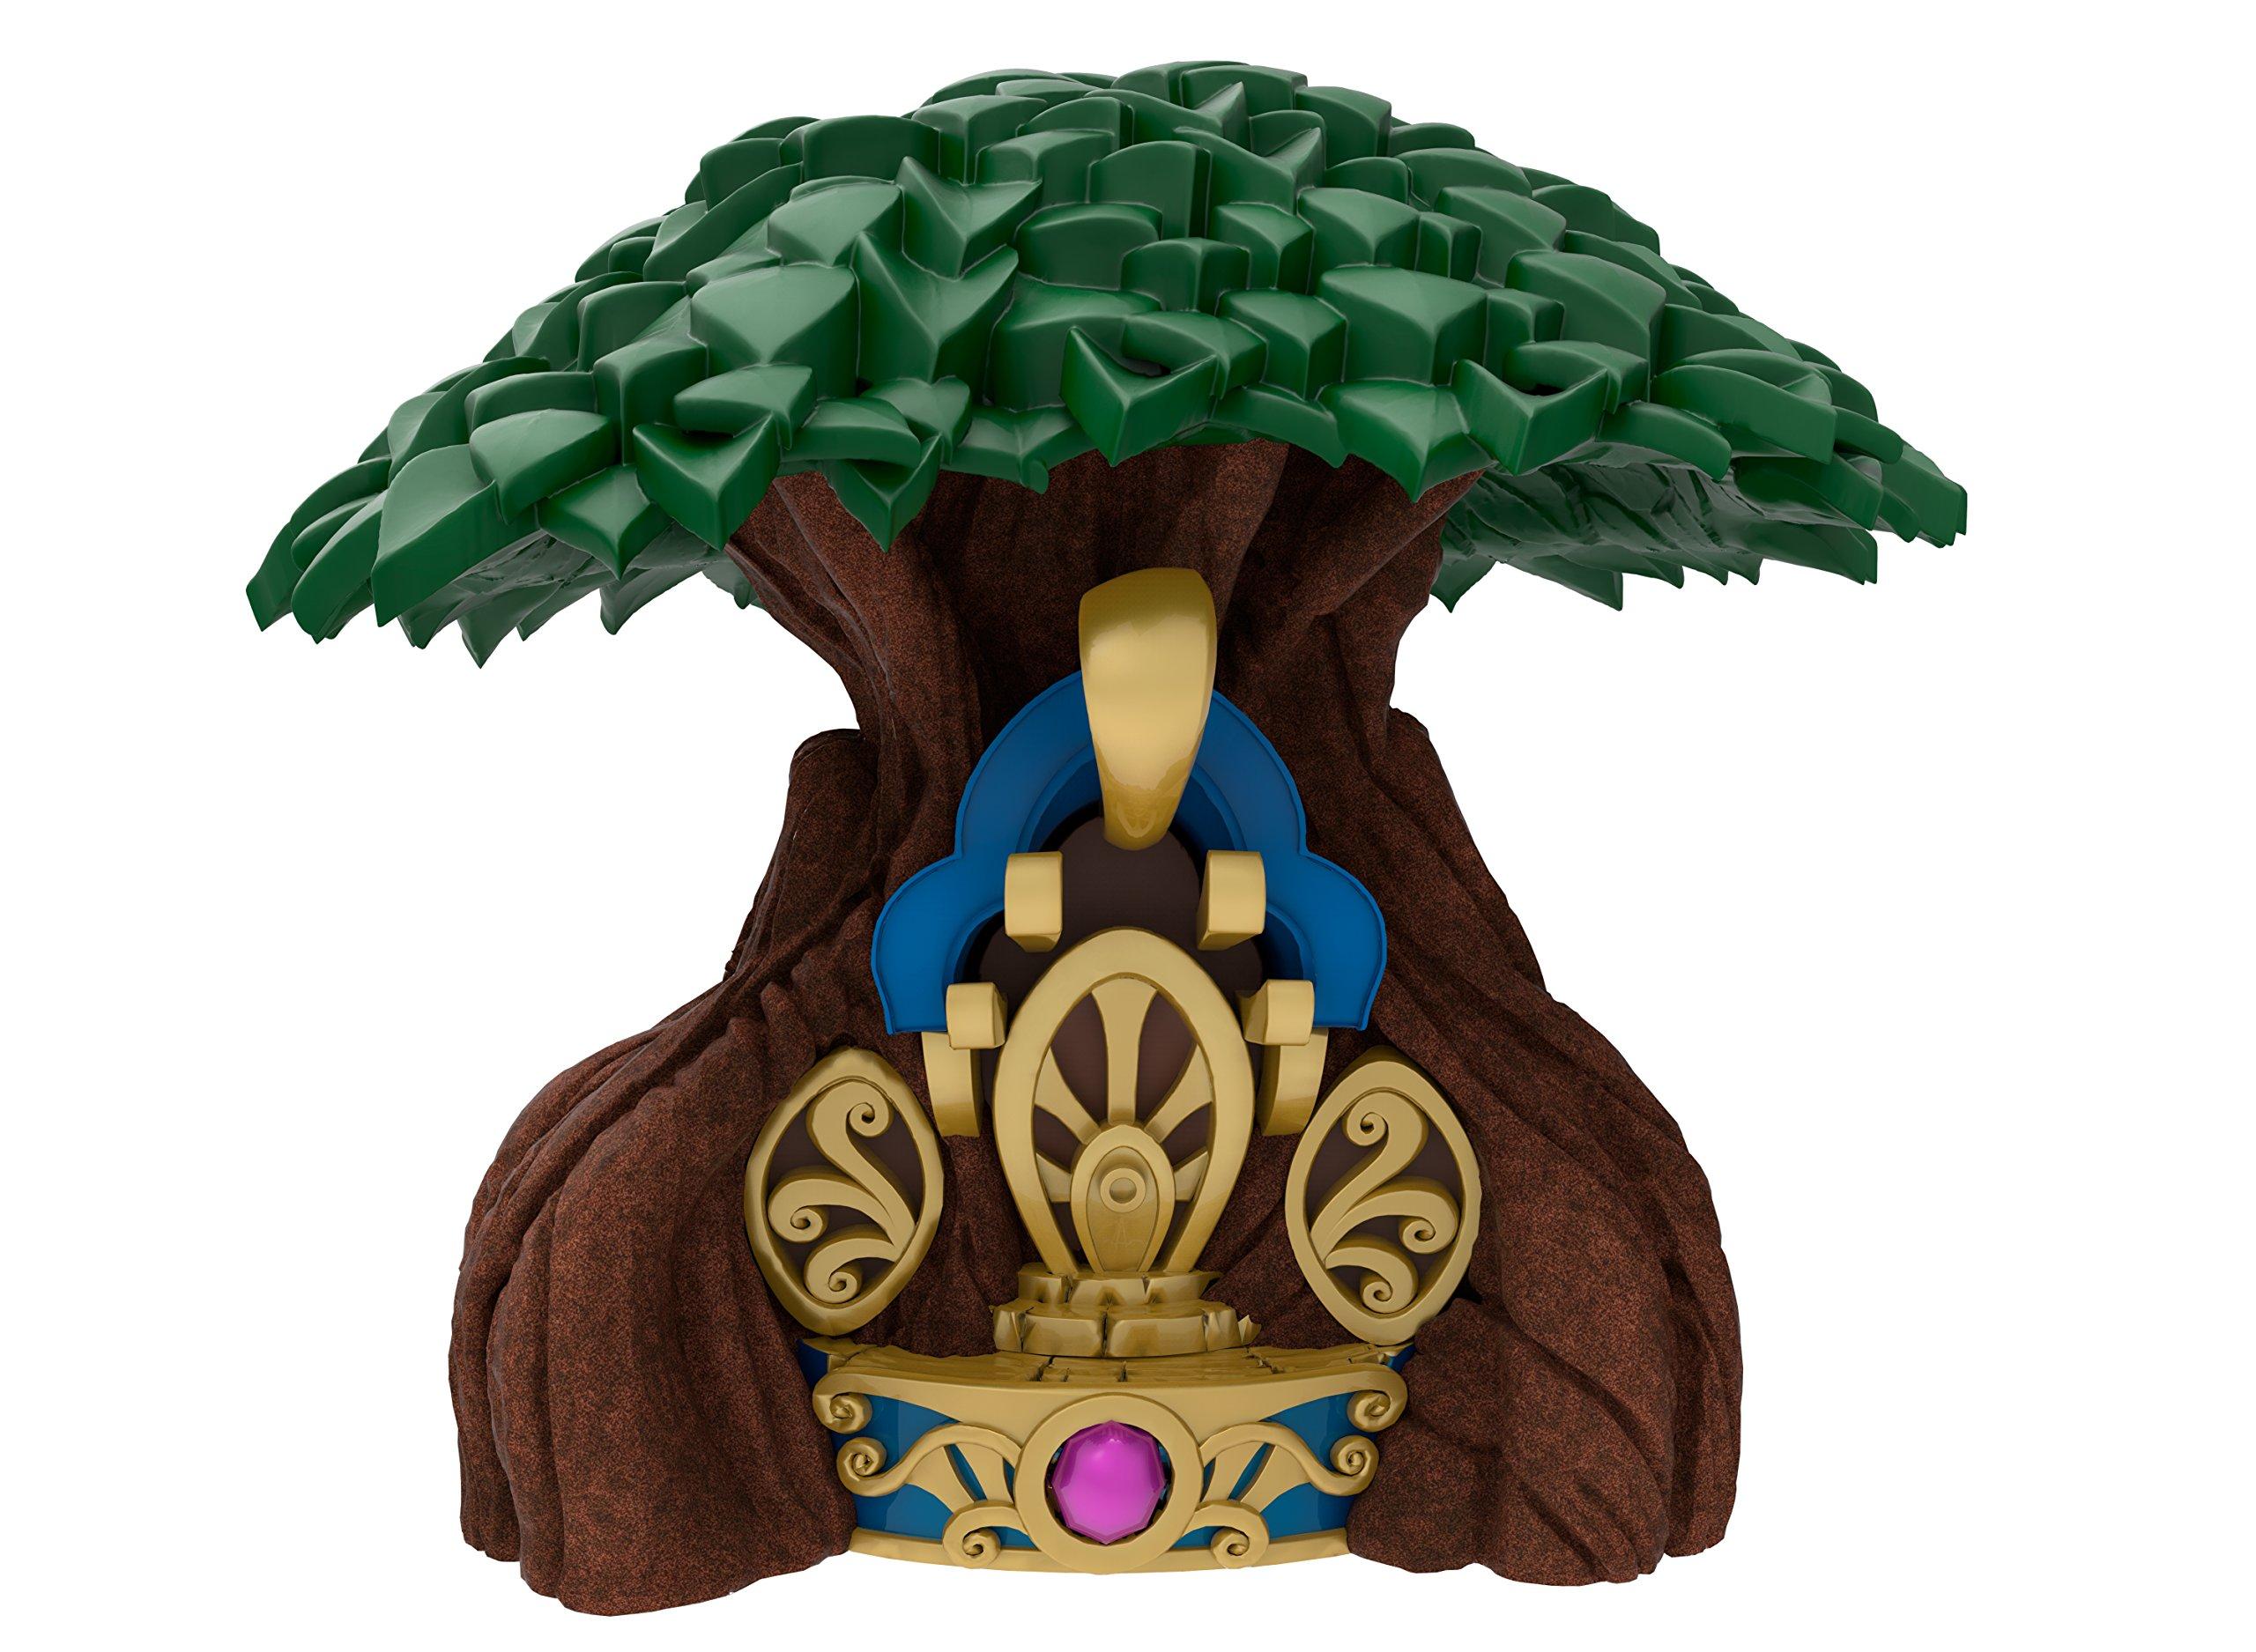 Skylanders Imaginators Enchanted Elven Forest Adventure Pack by Activision (Image #2)